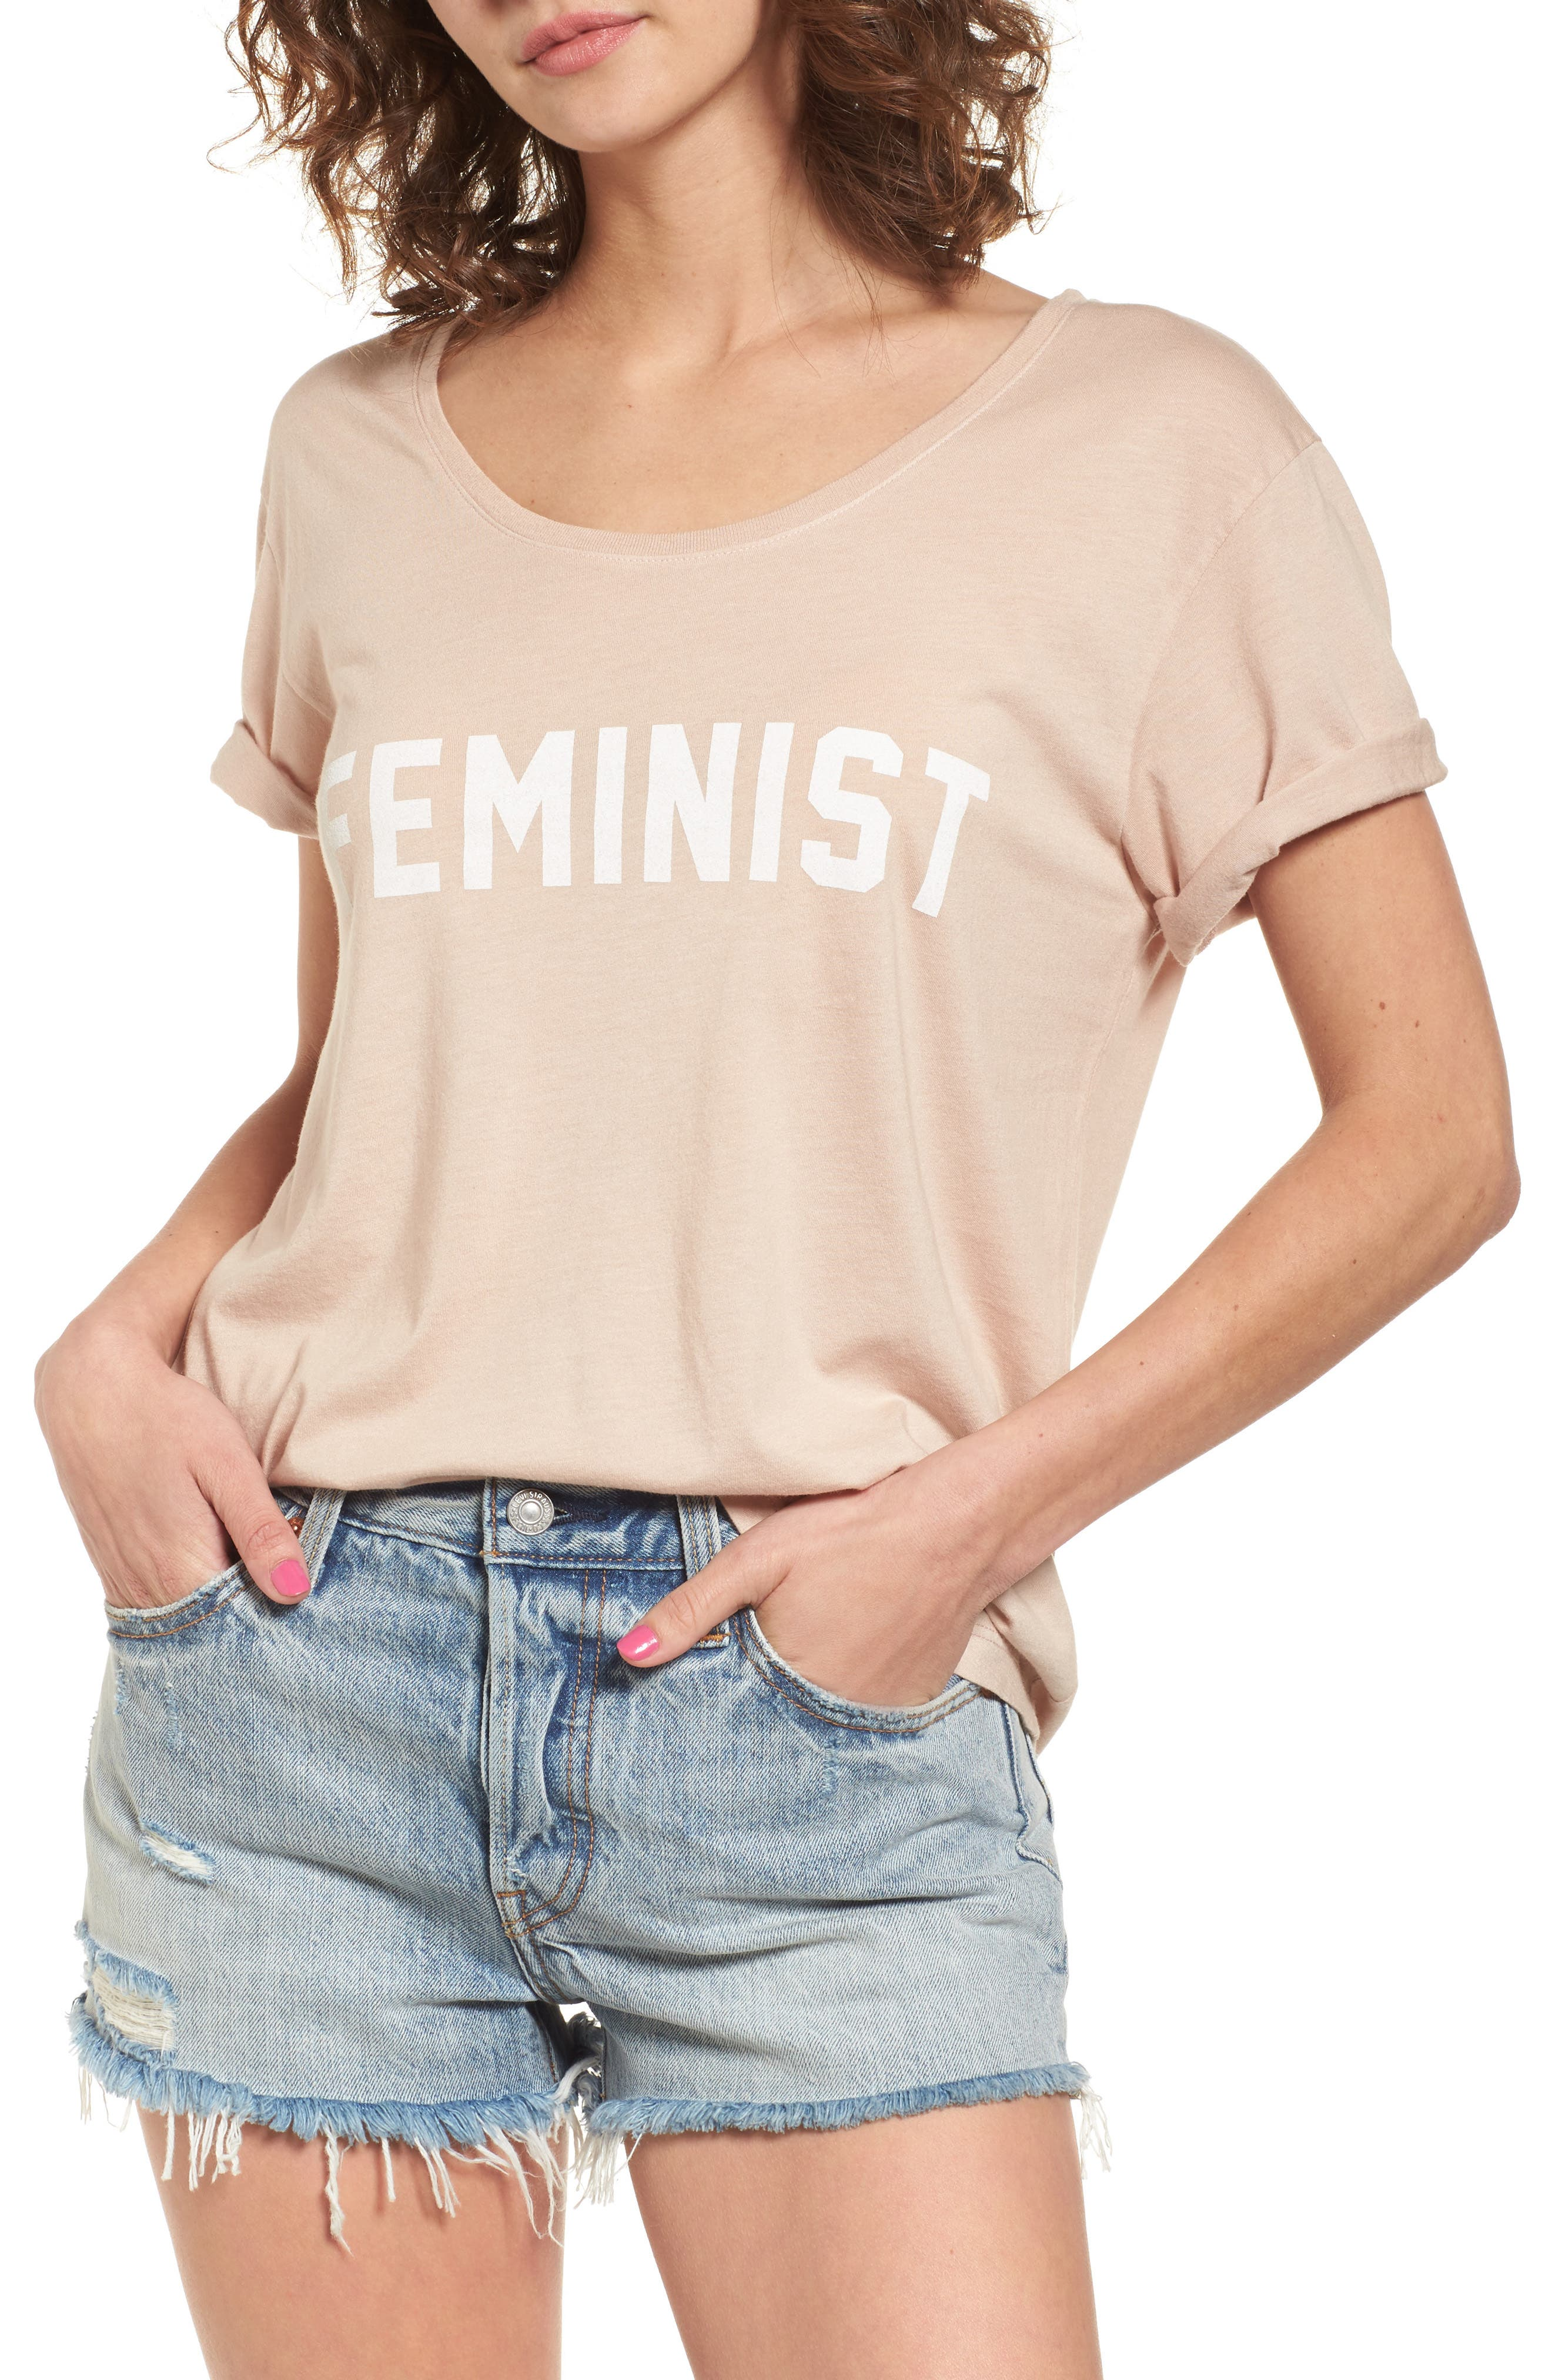 Feminist Graphic Tee,                             Main thumbnail 1, color,                             250